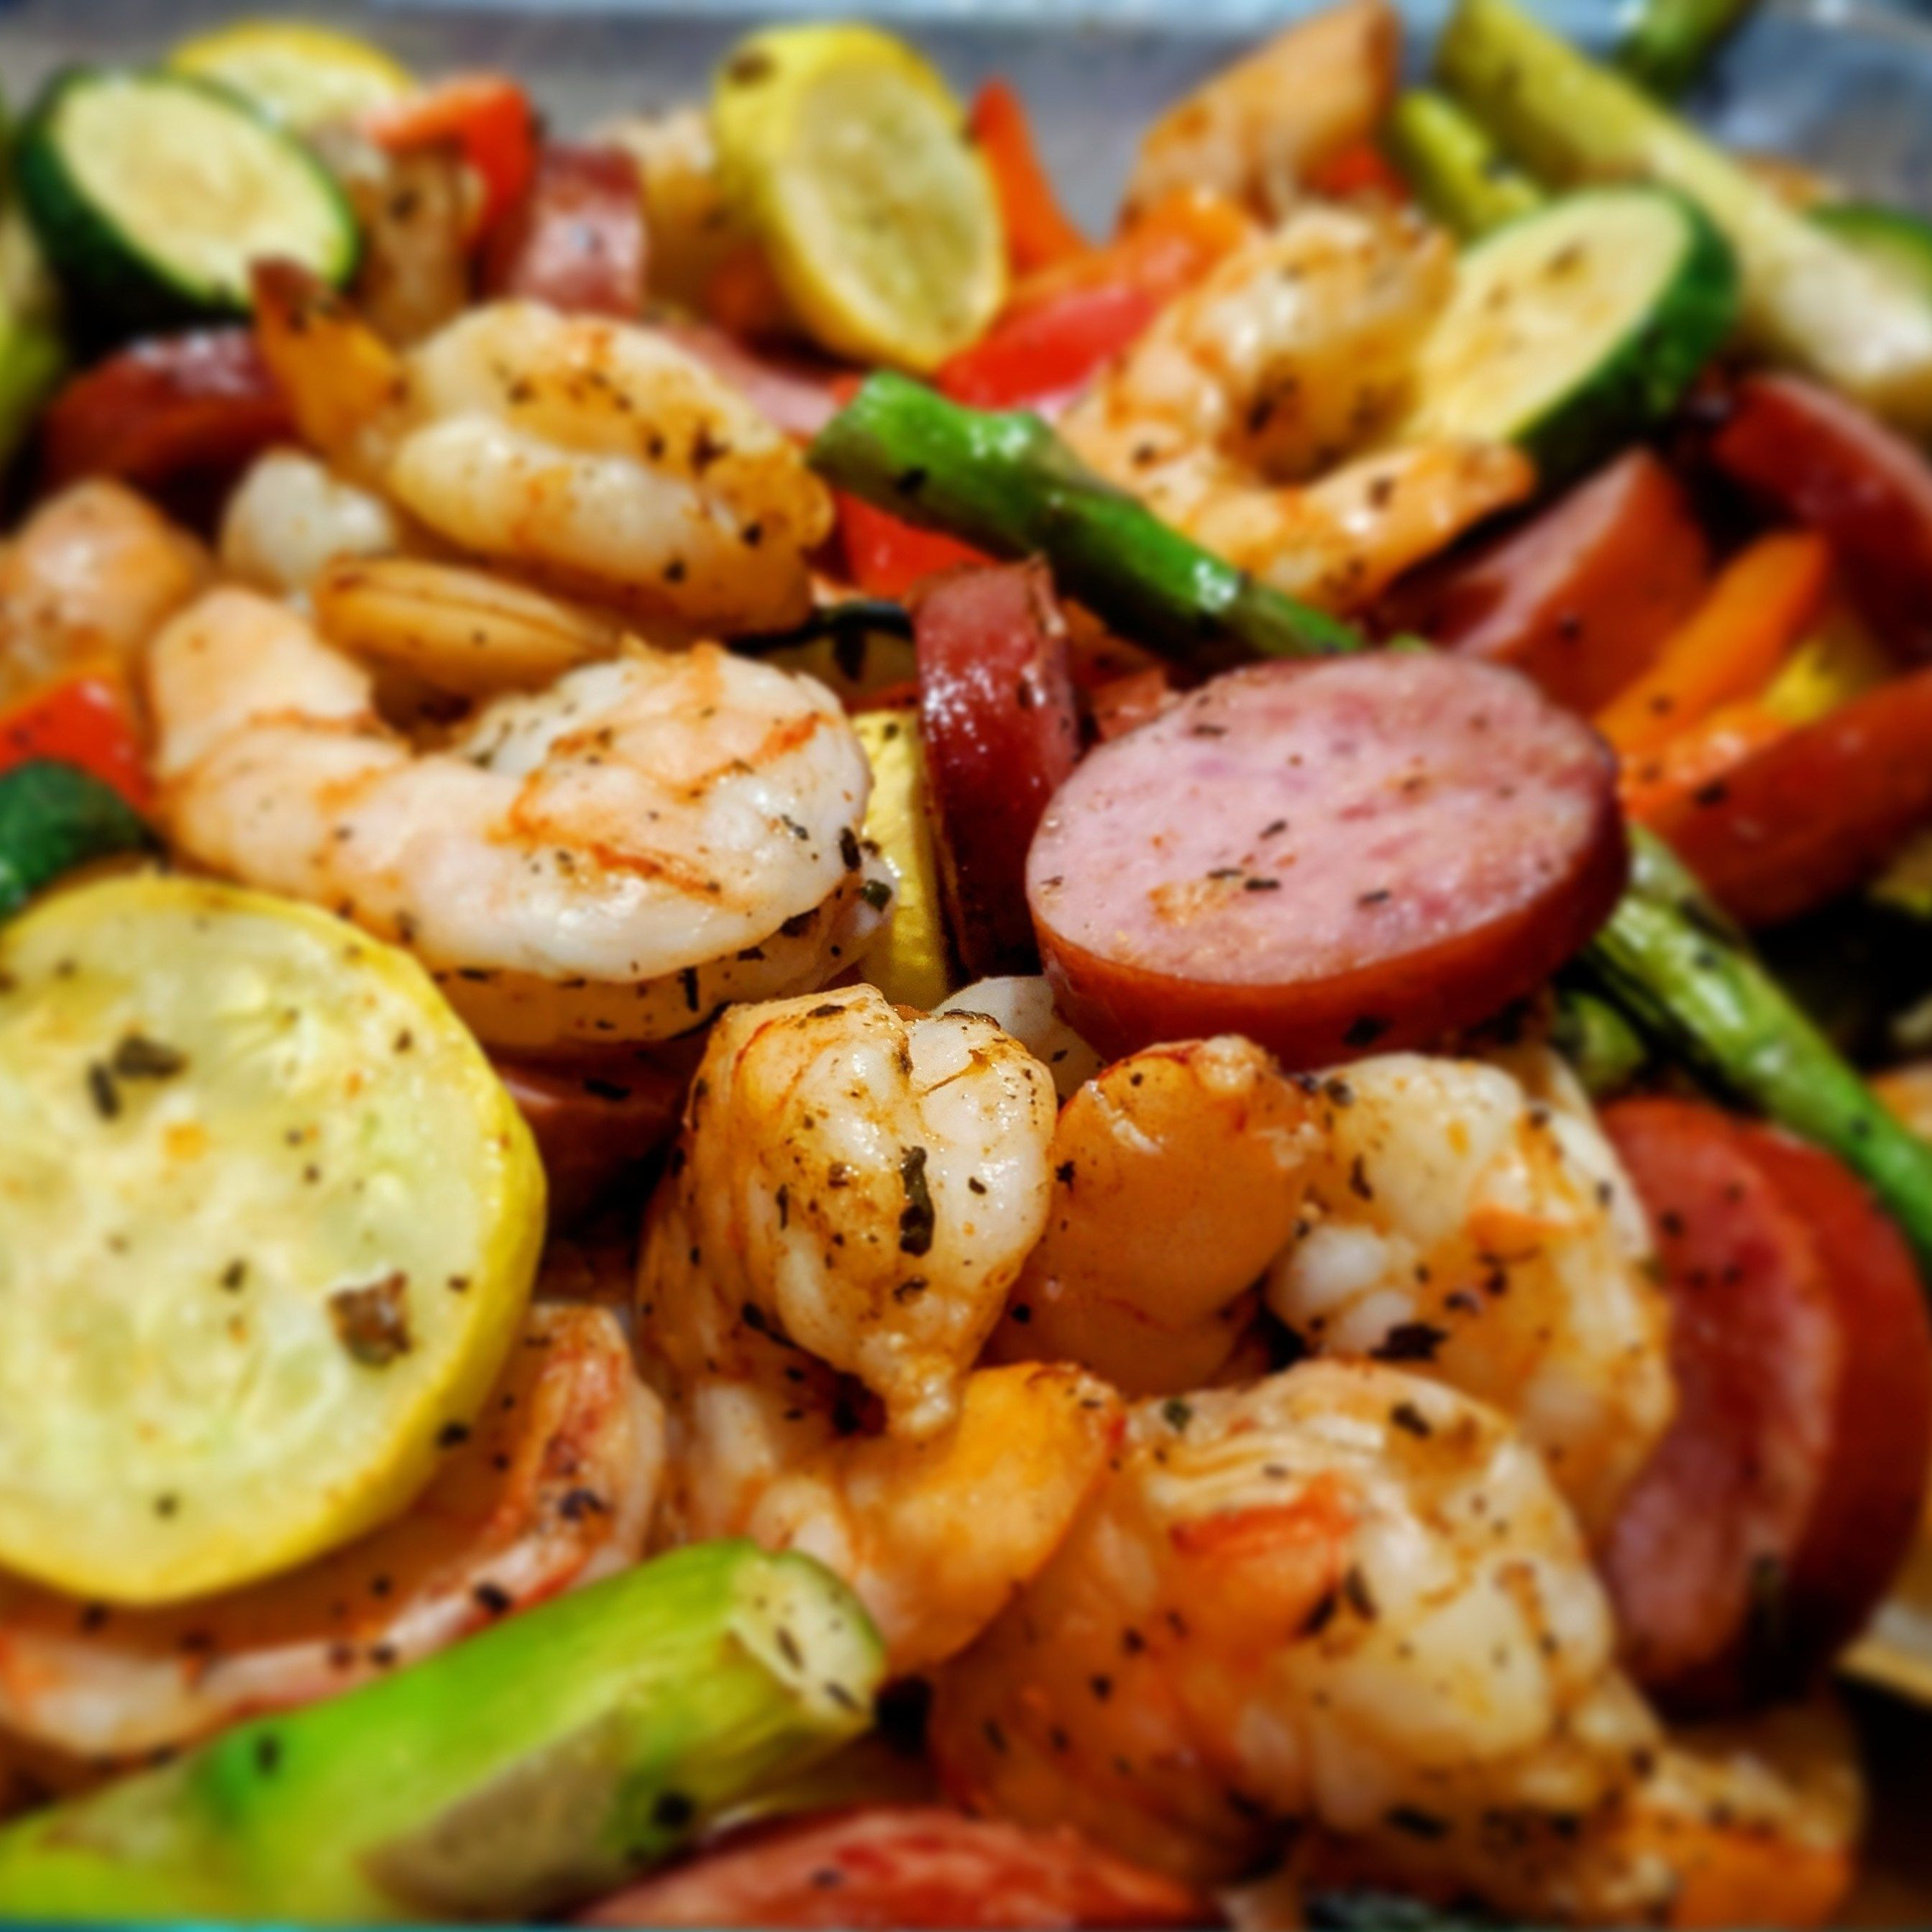 Healthy Air Fryer Keto & Gluten Free Old Bay Shrimp